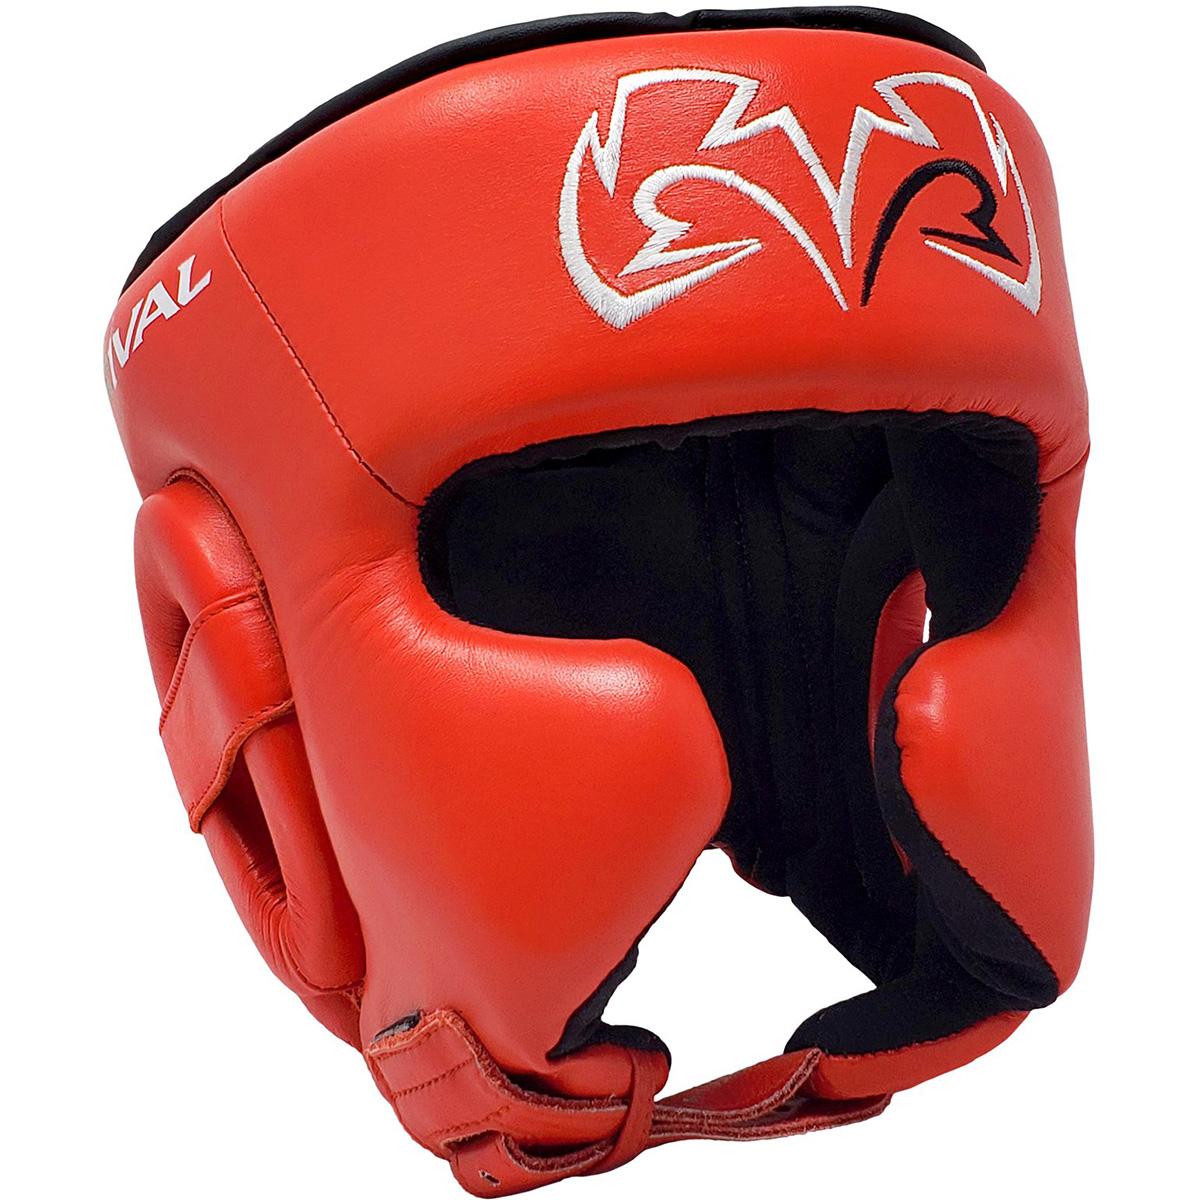 thumbnail 9 - RIVAL Boxing RHG2 Training Headgear